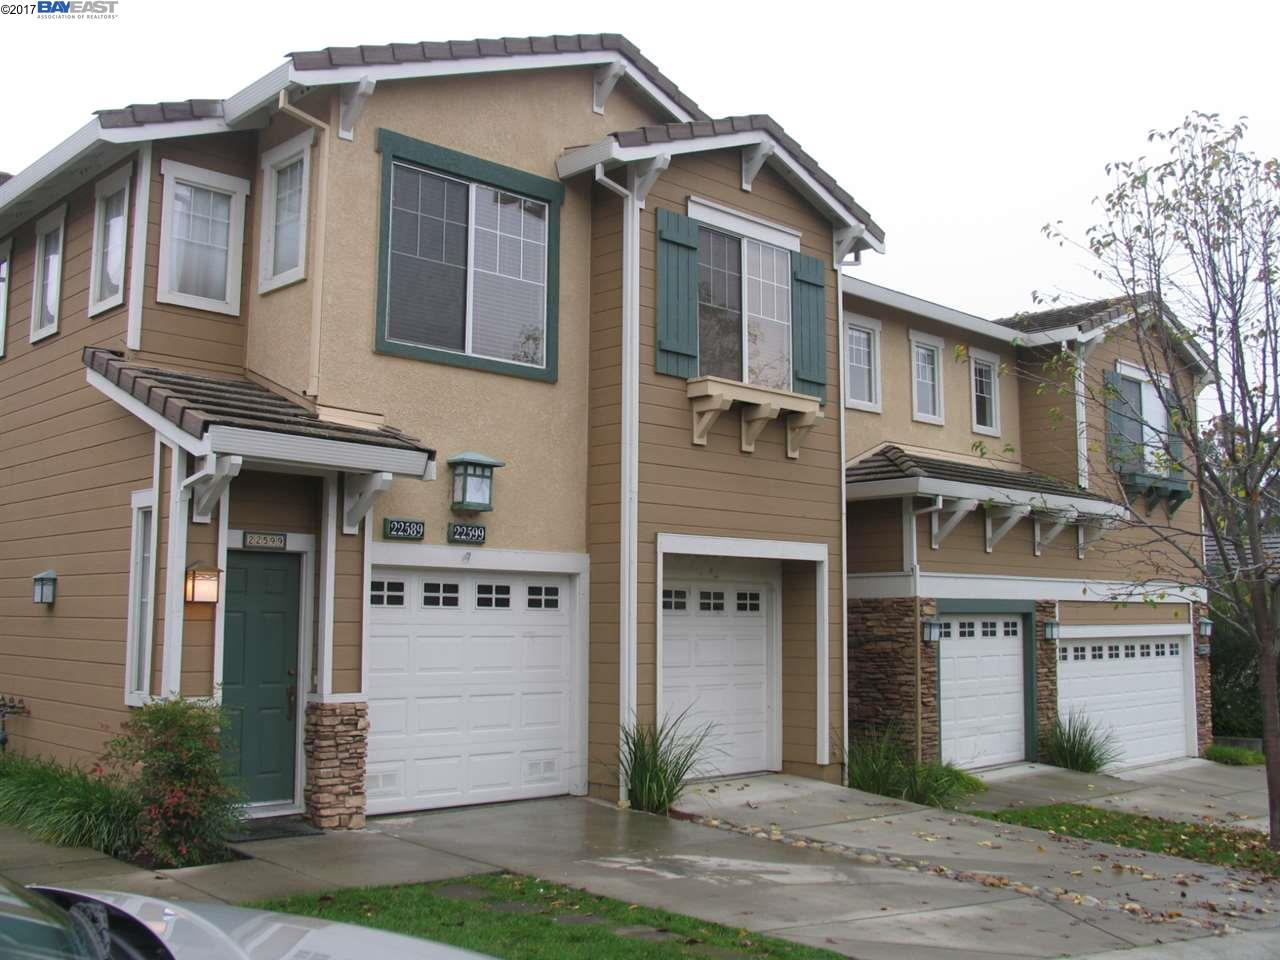 22599 Canyon Terrace Dr, CASTRO VALLEY, CA 94552